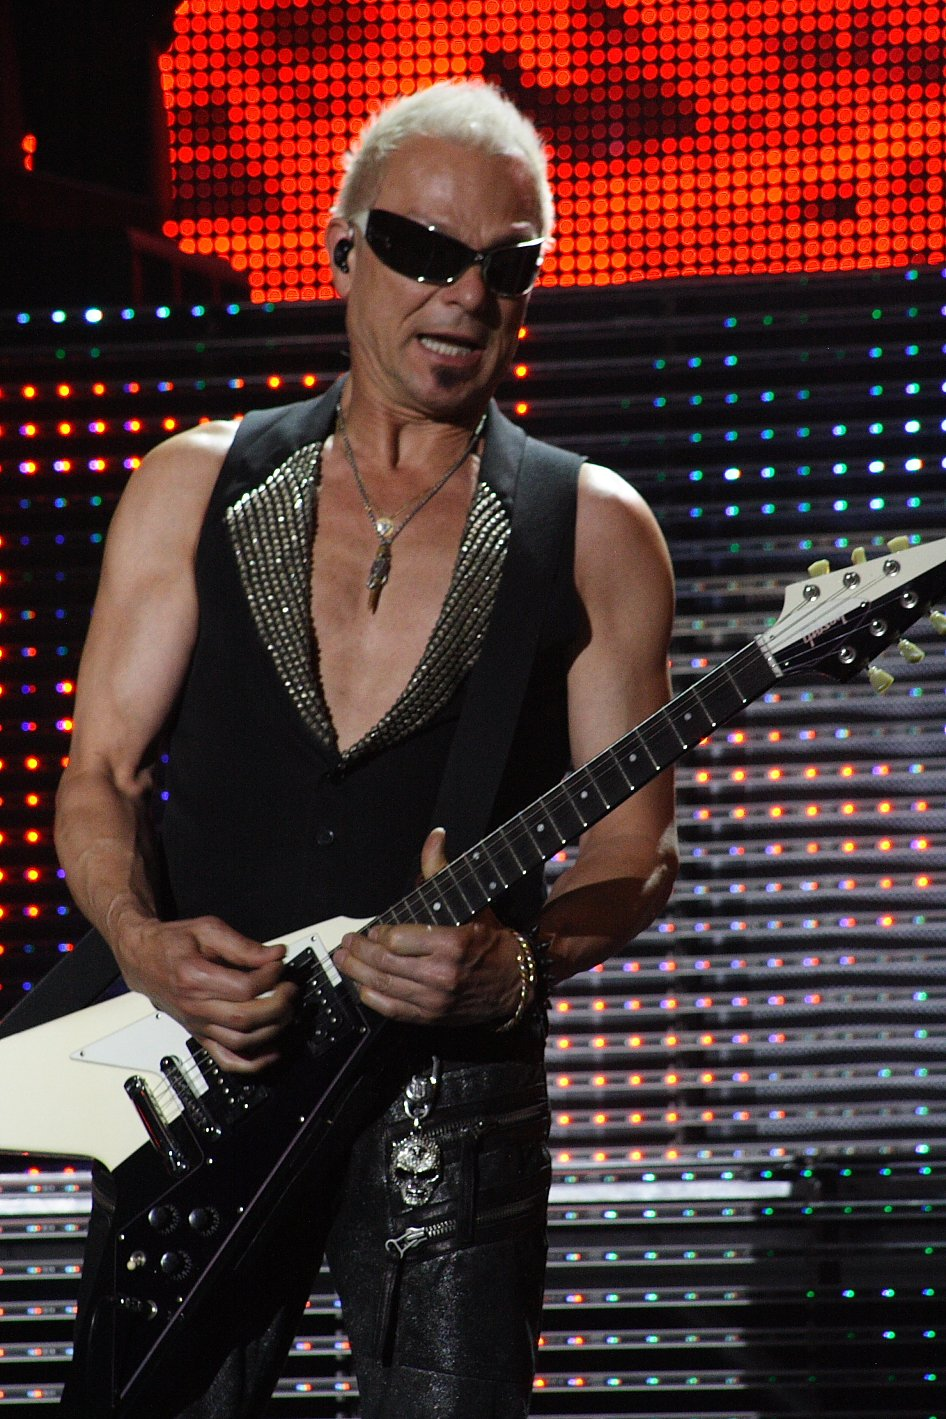 Scorpions Concert Photo